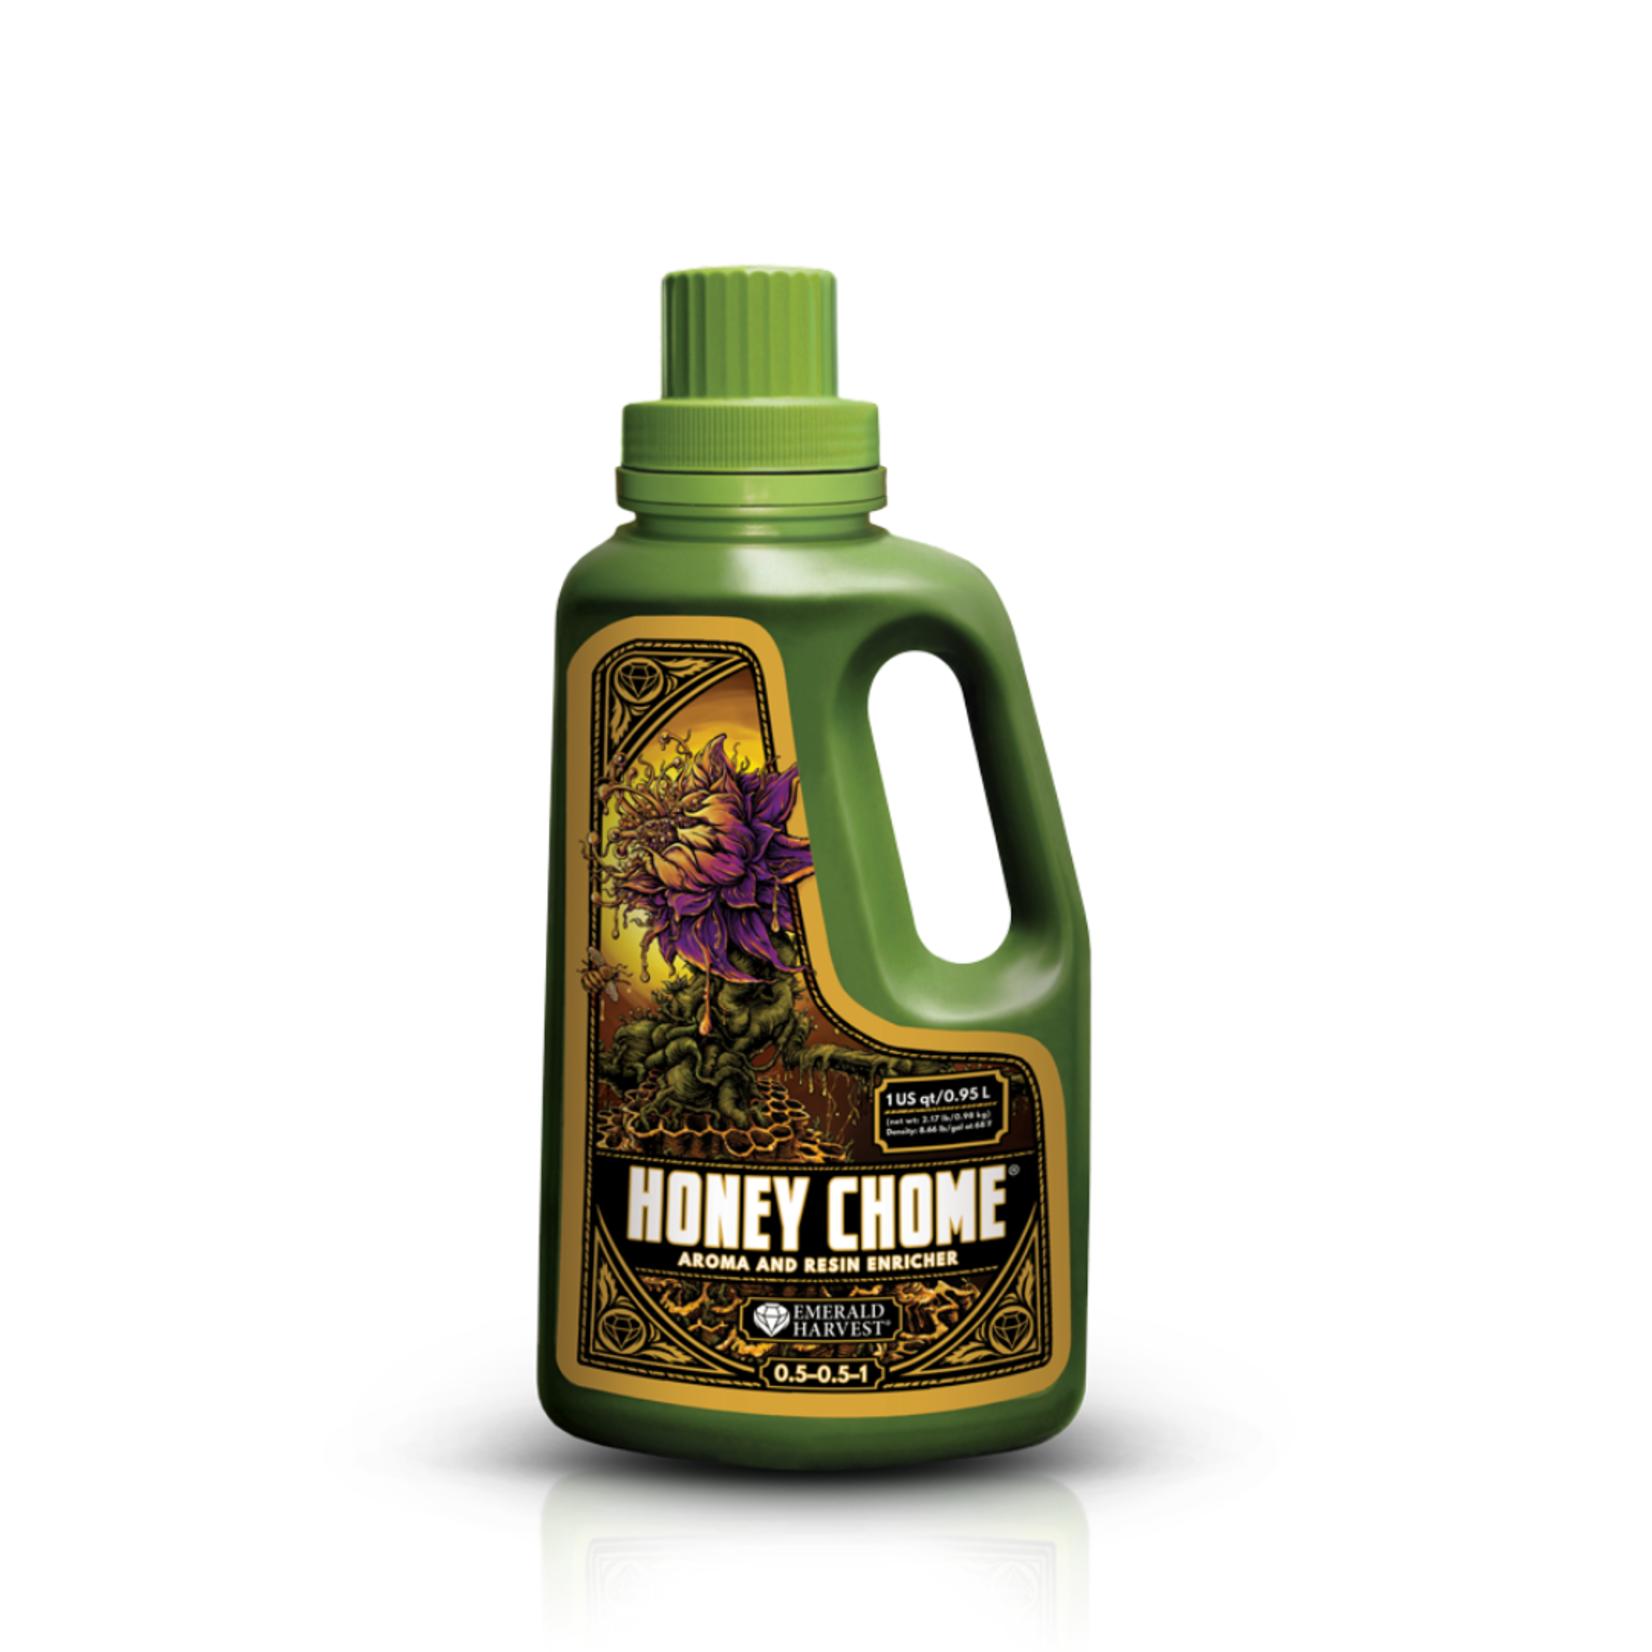 Emerald Harvest Emerald Harvest Honey Chome